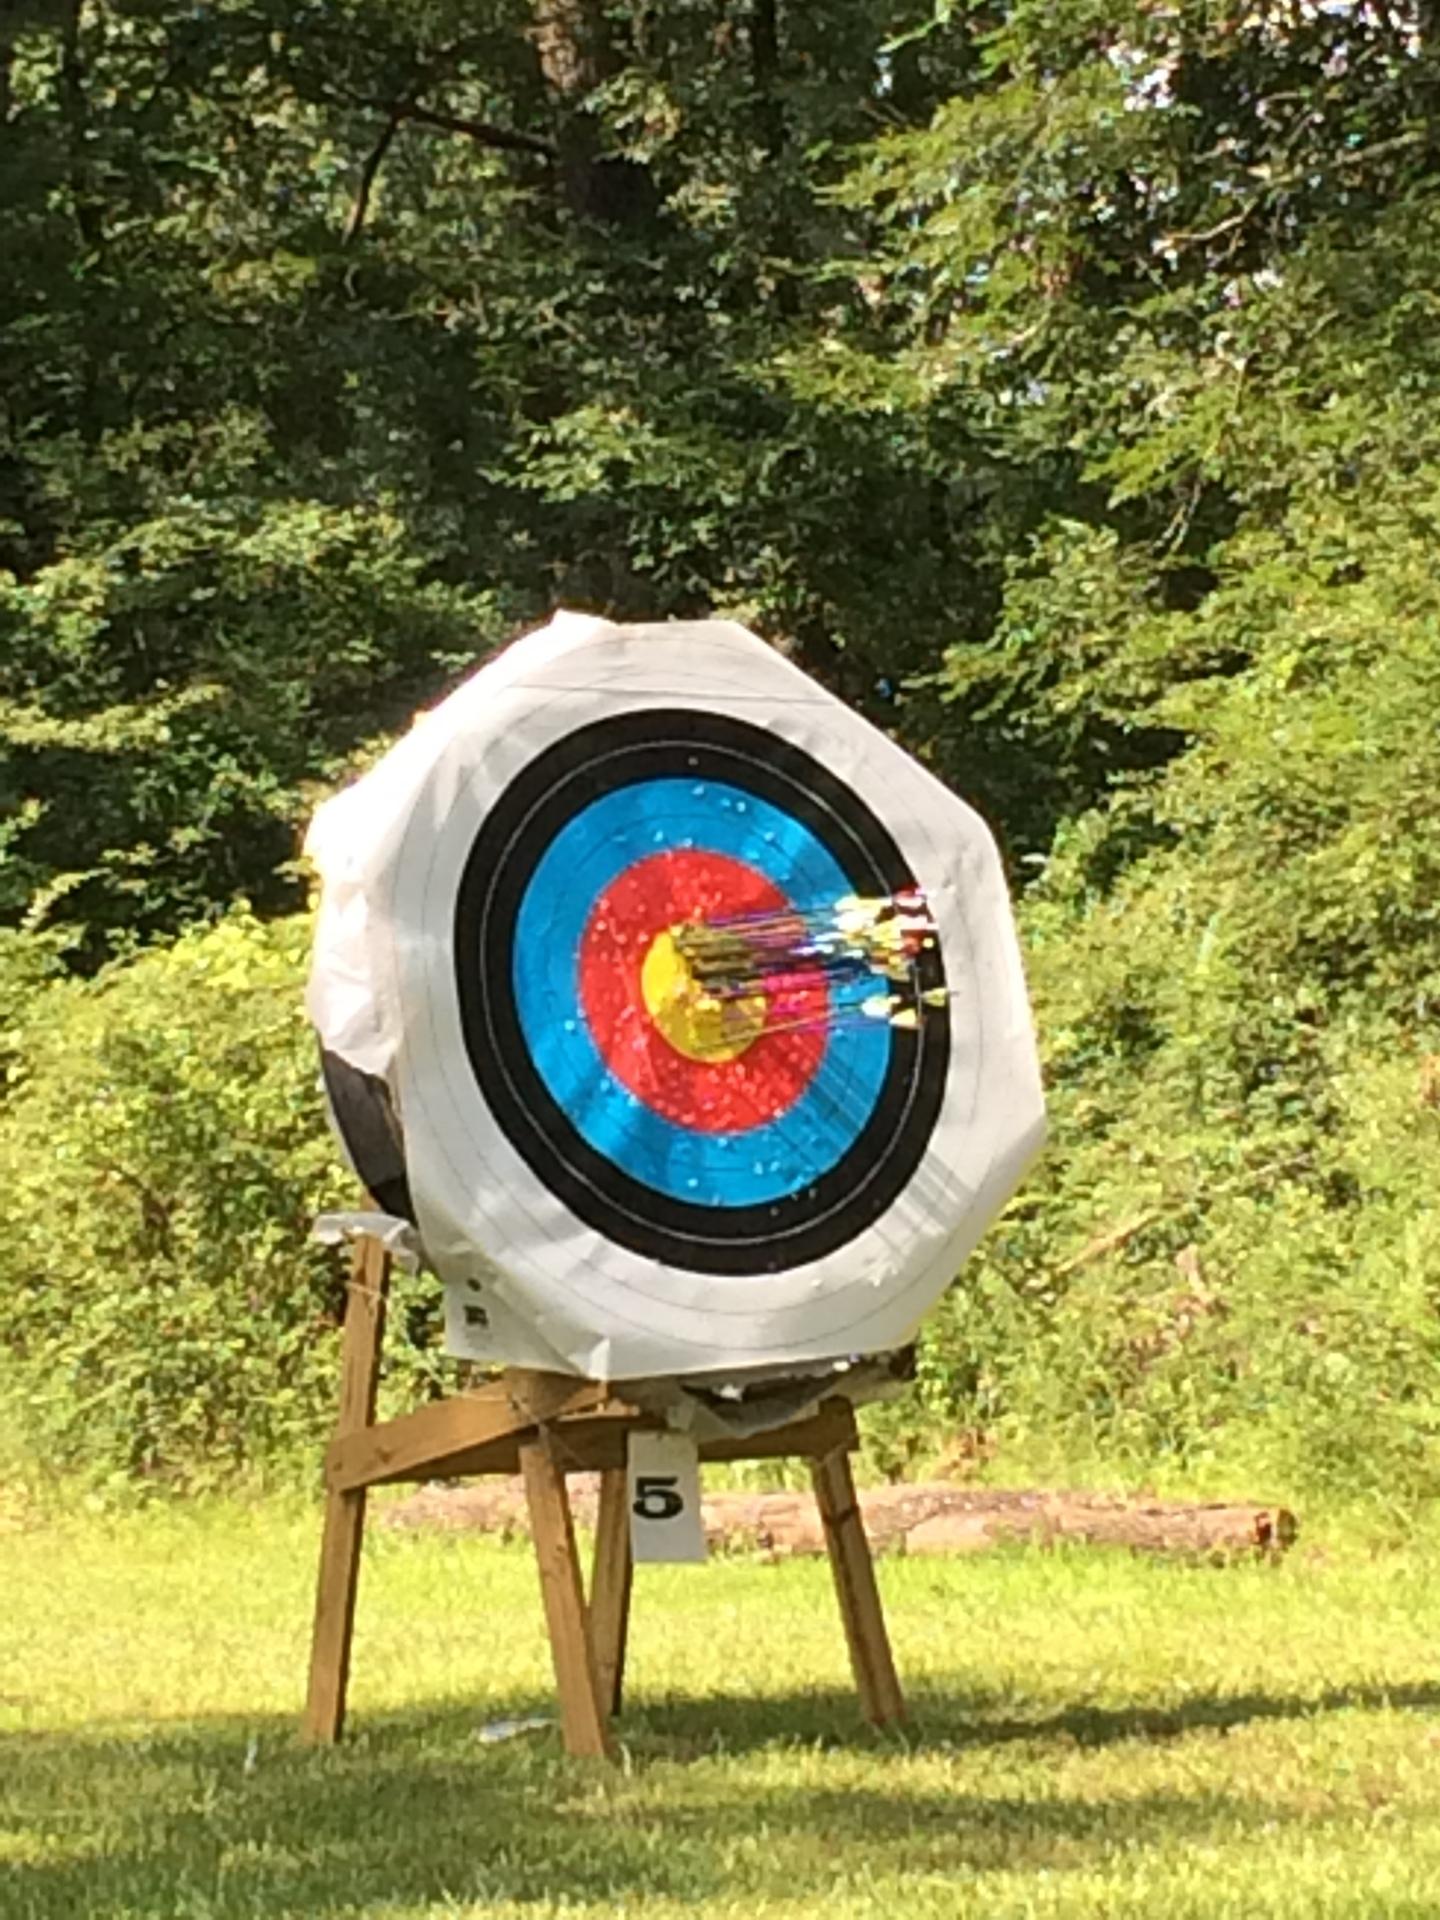 Caddo Archery is shifting gears